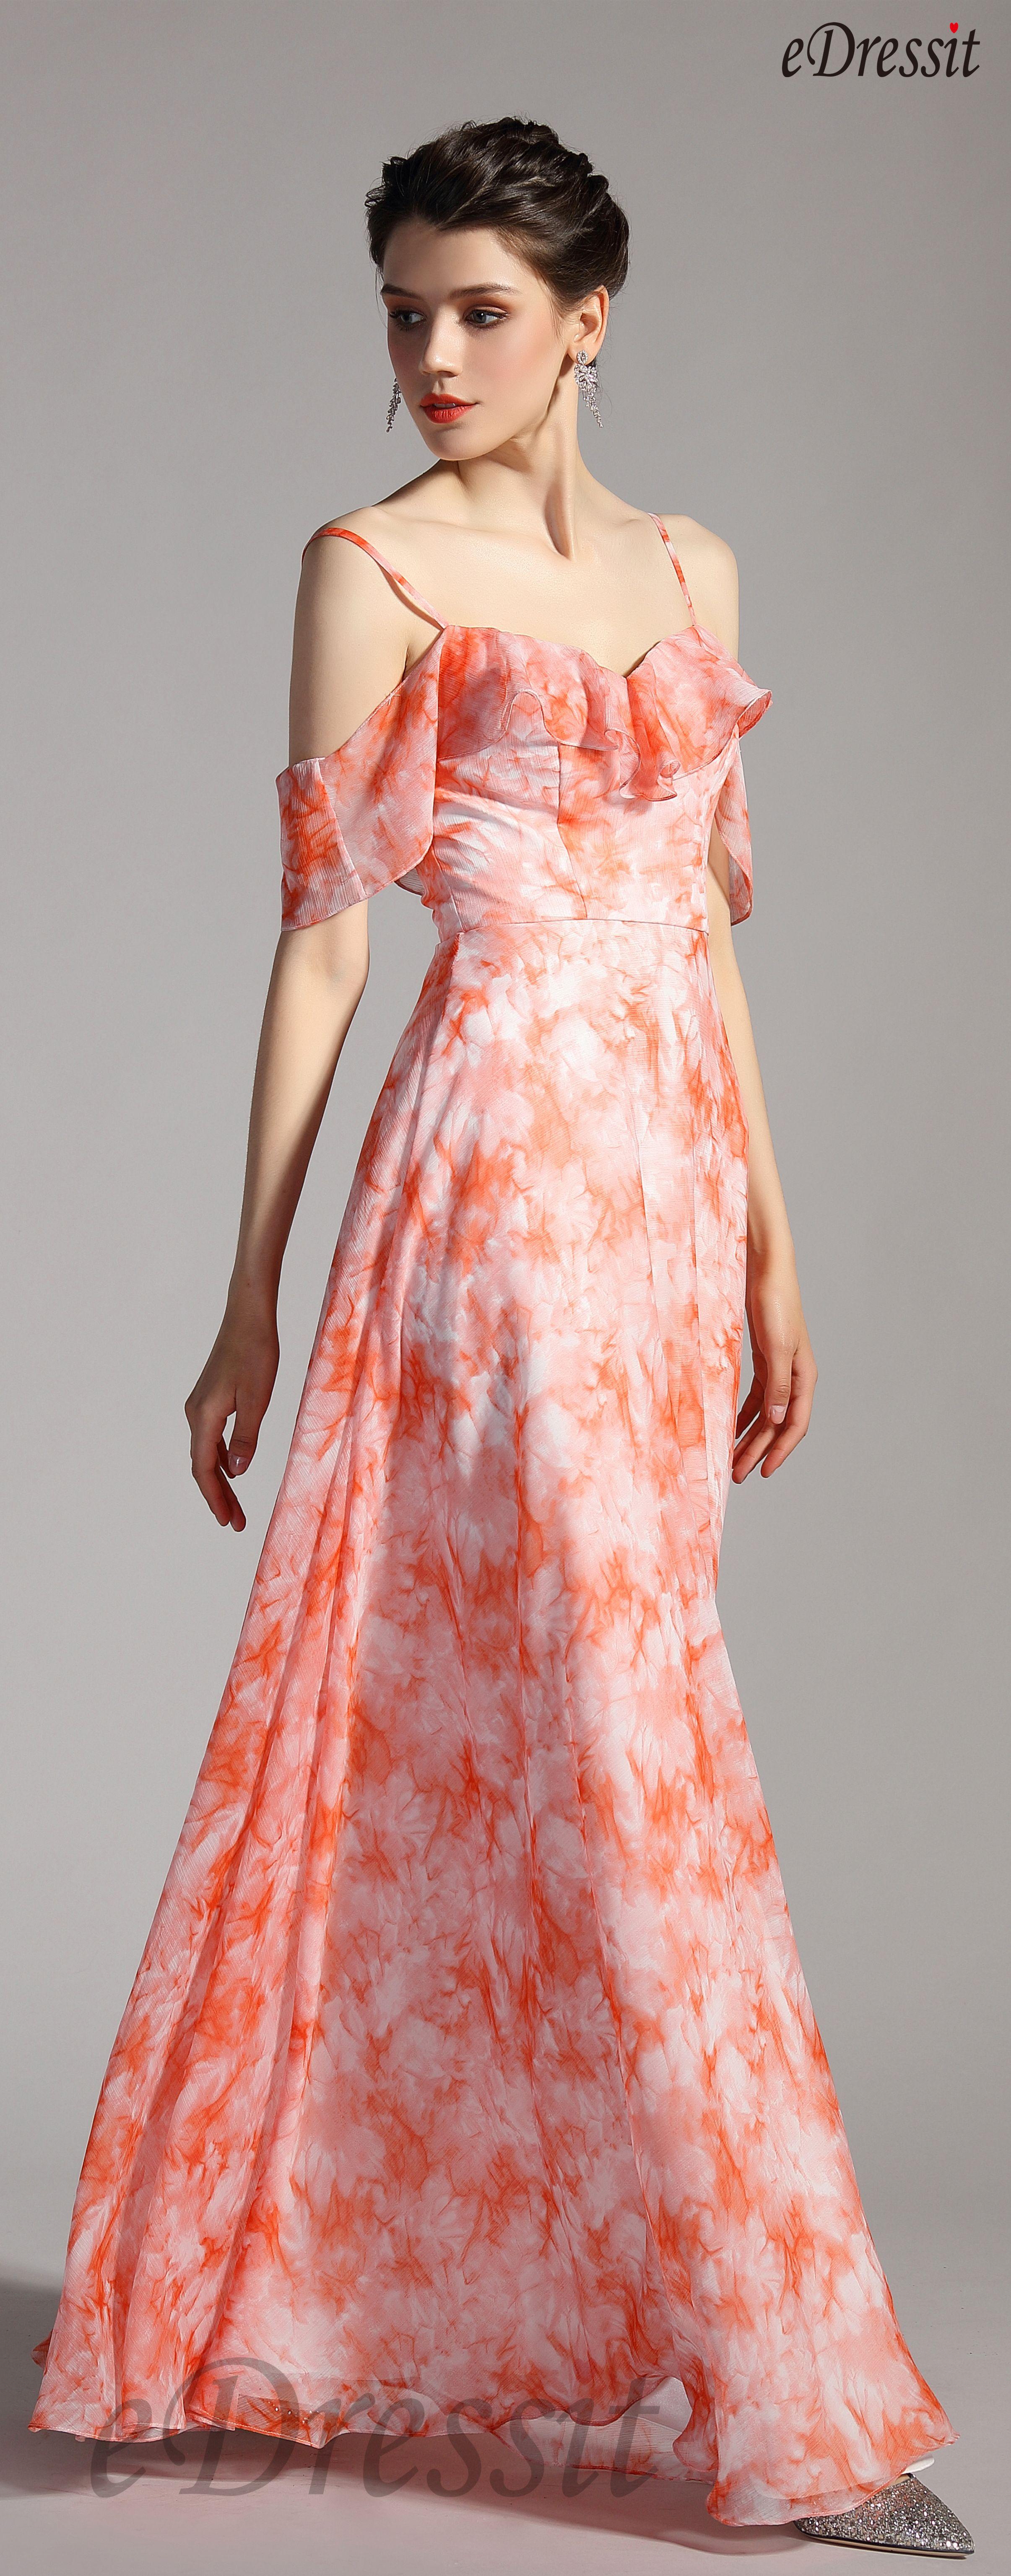 Edressit Spaghetti Off Shoulder Printed Summer Party Dress 00206968 Summer Party Dress Party Dress Dresses [ 6146 x 2411 Pixel ]